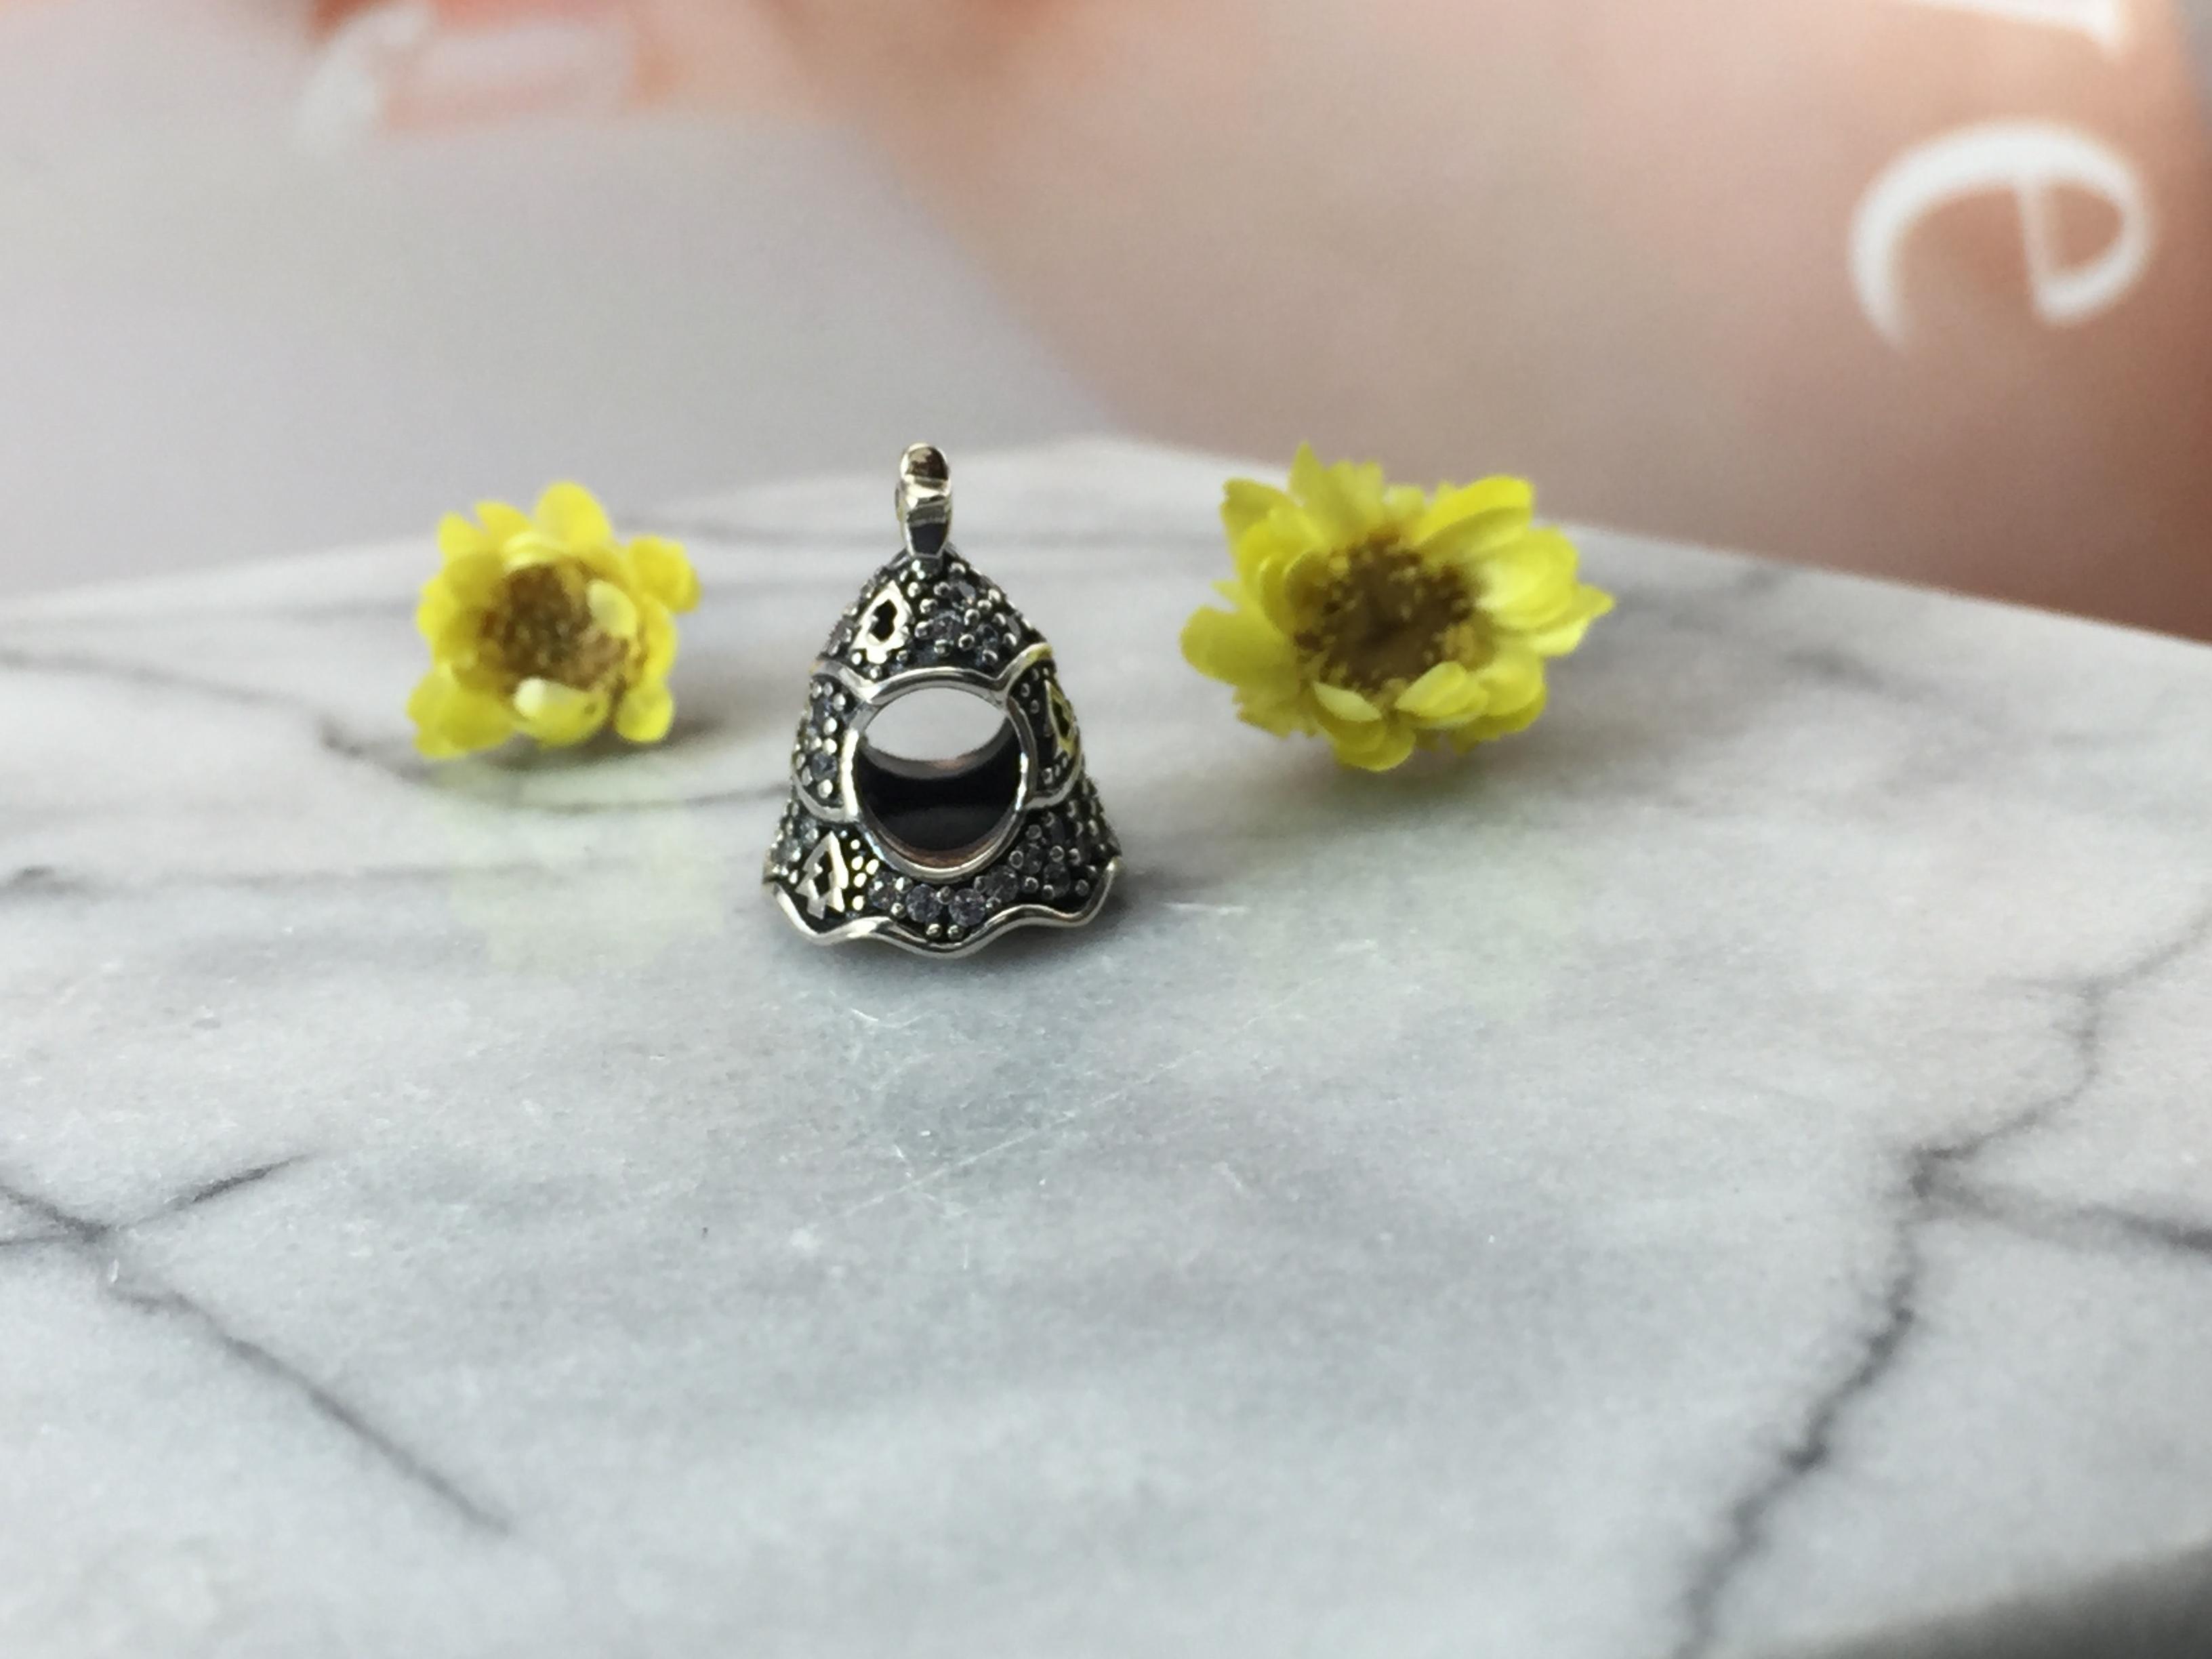 FAHMI 100% 925 Sterling Silver 1:1 Authentic 791765CZ Twinkling Christmas Tree Charm  Bracelet Original  Women  Jewelry 2